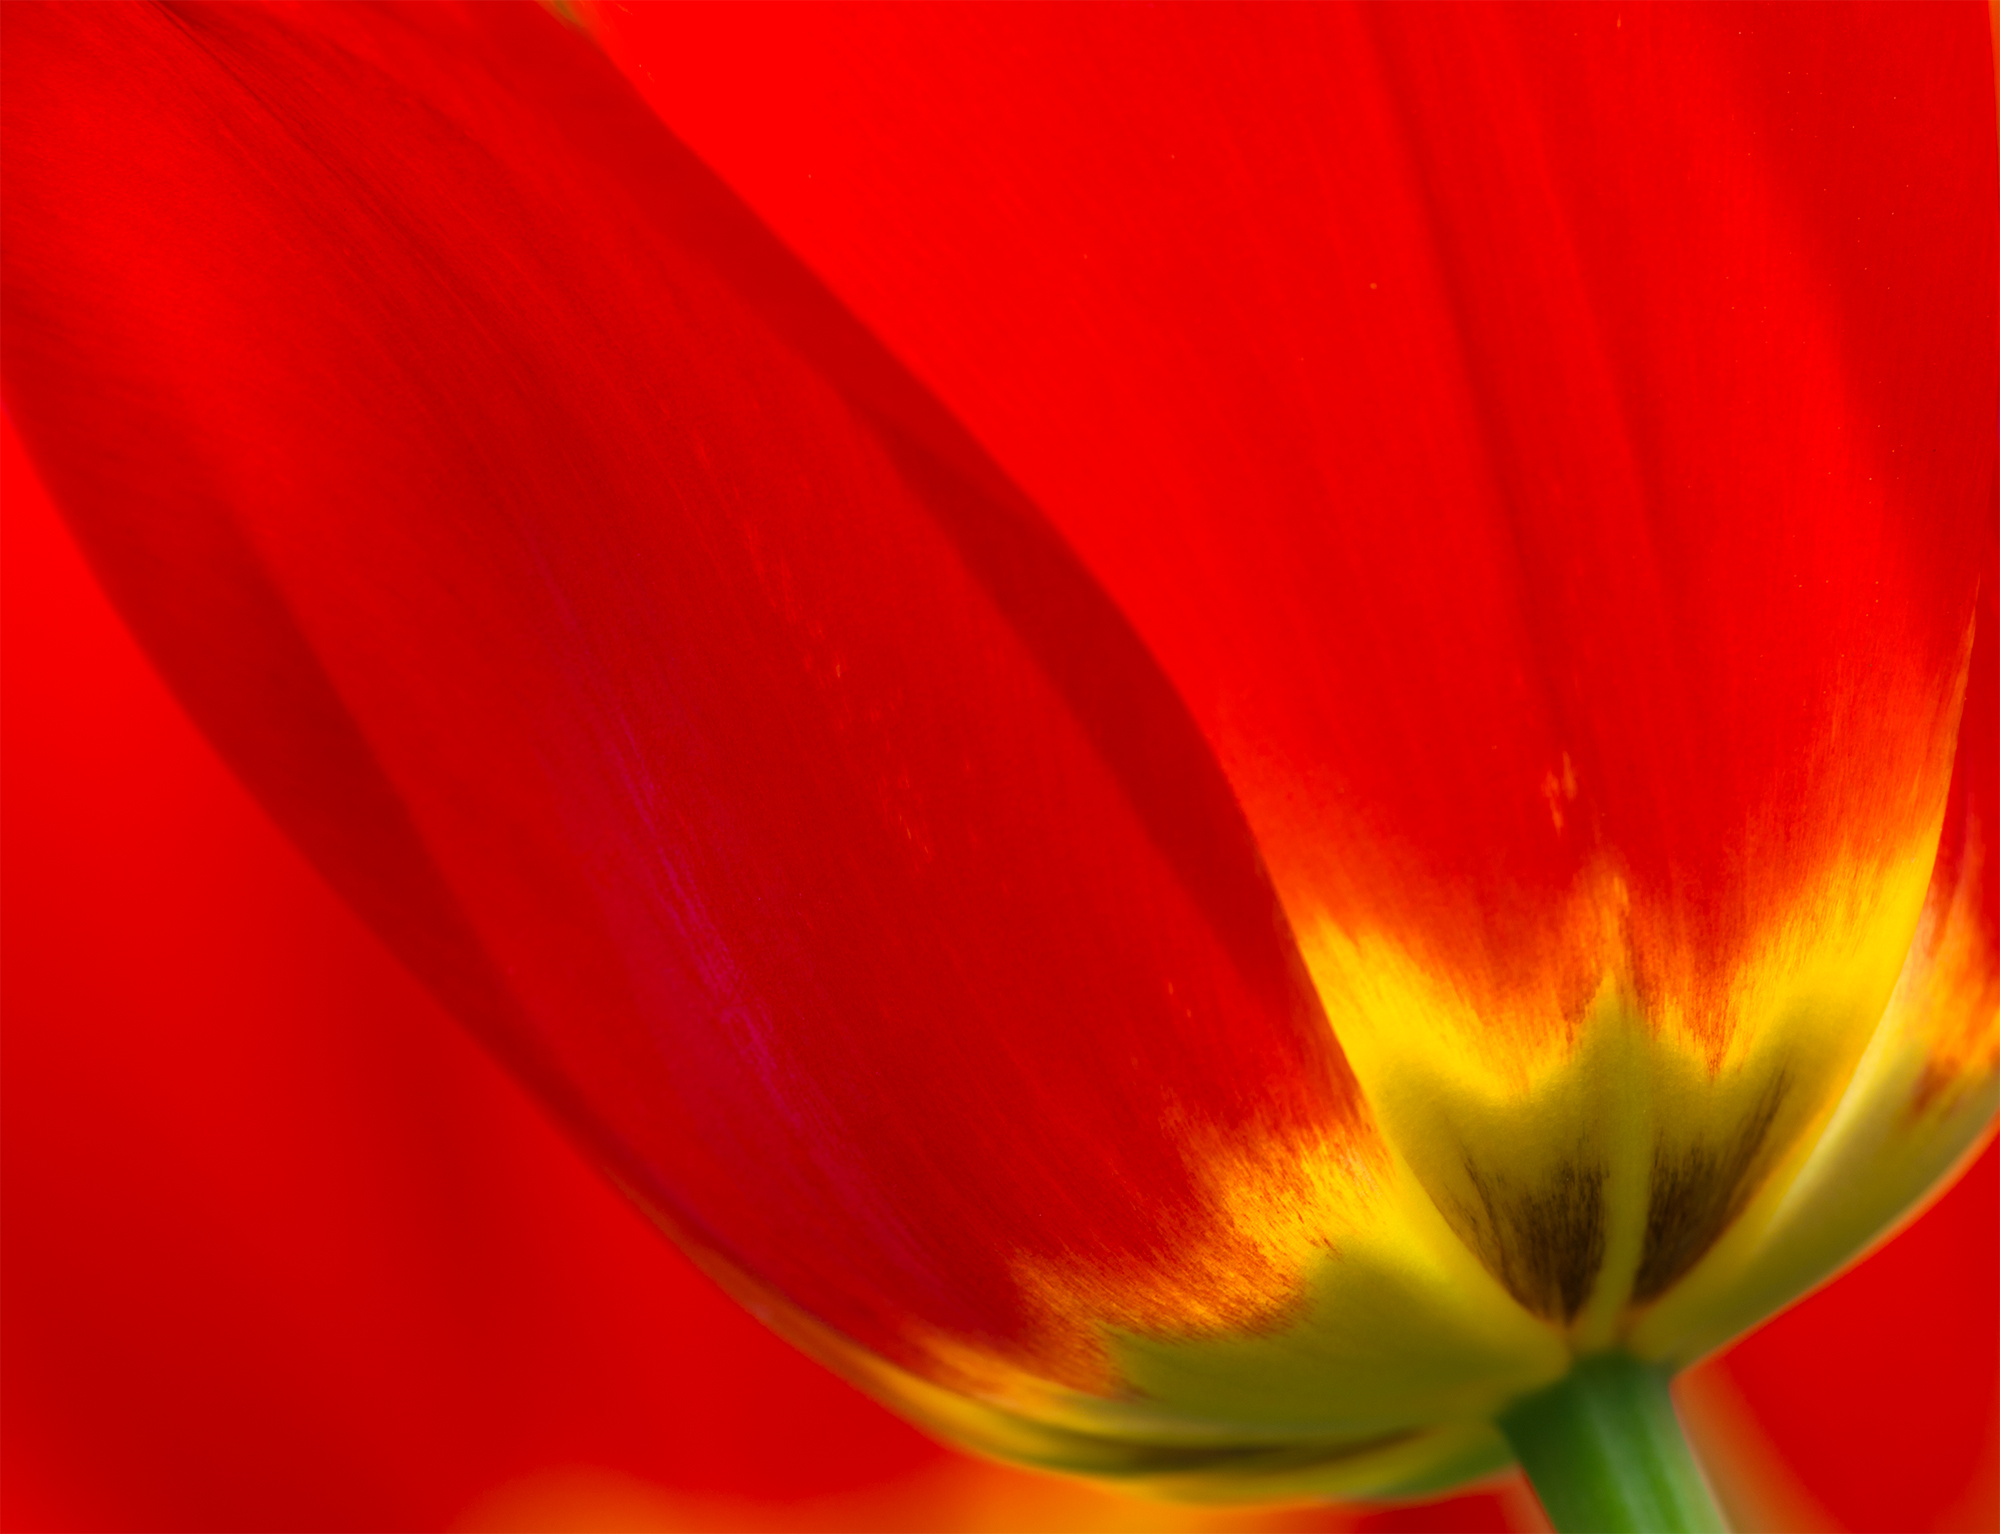 tulip-fire.jpg